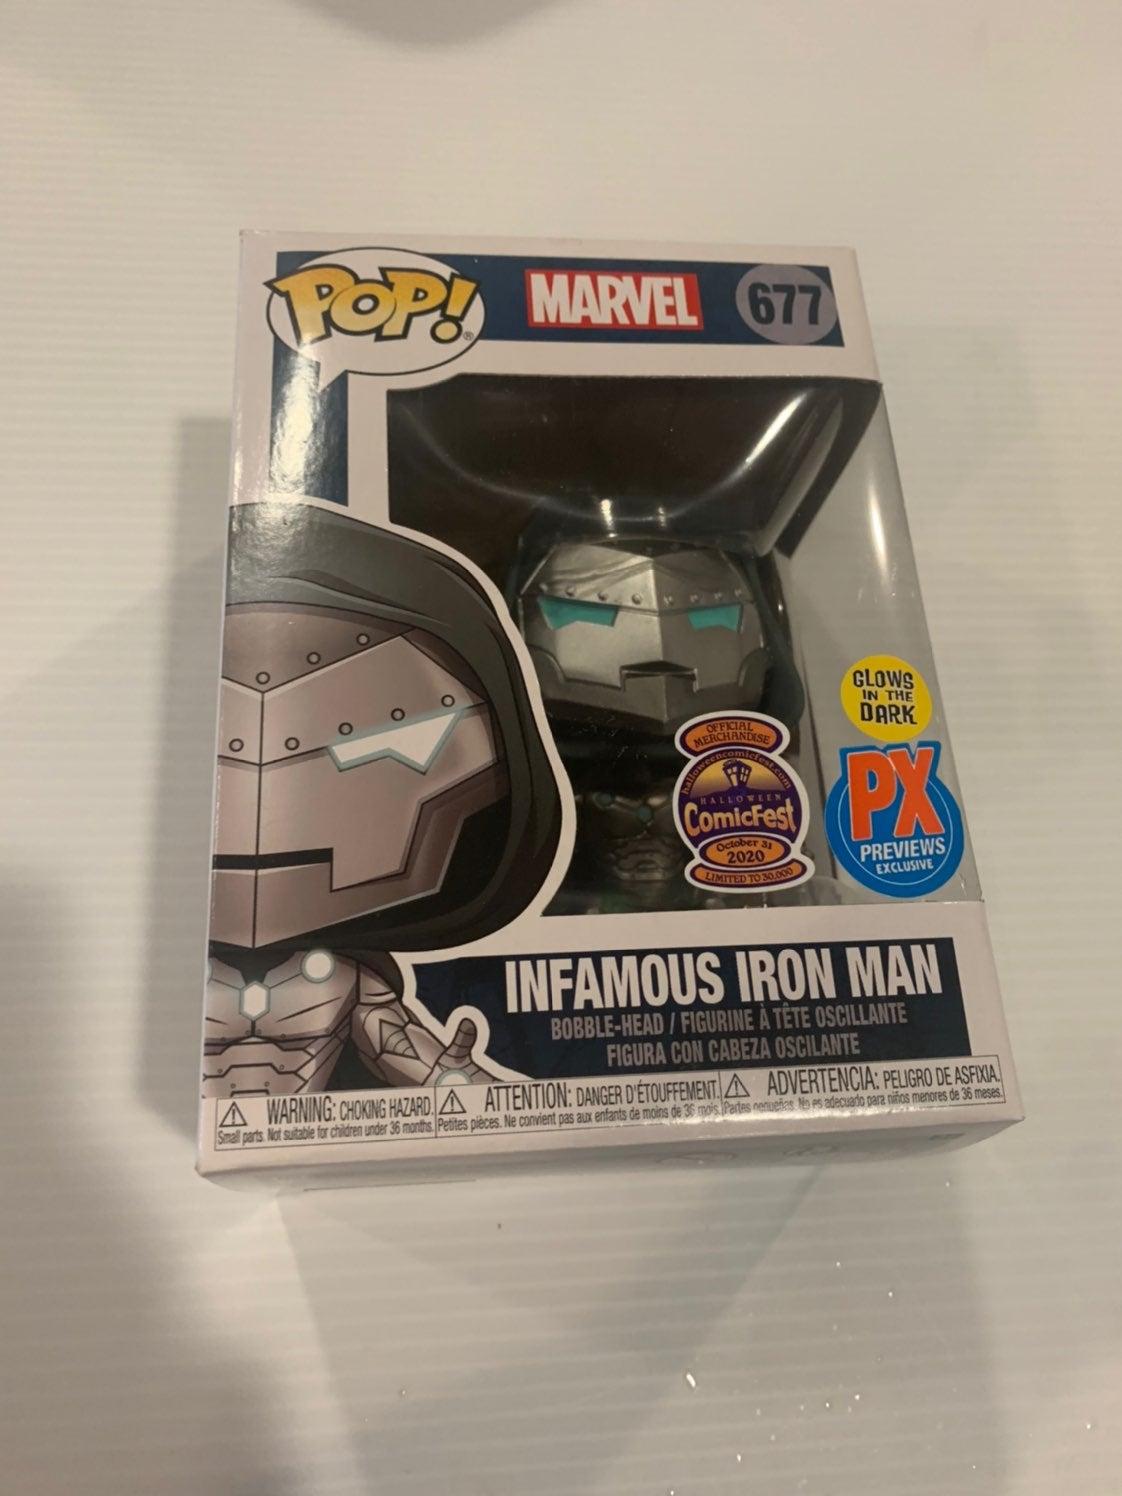 FUNKO POP! MARVeL Infamous Iron Man PX E